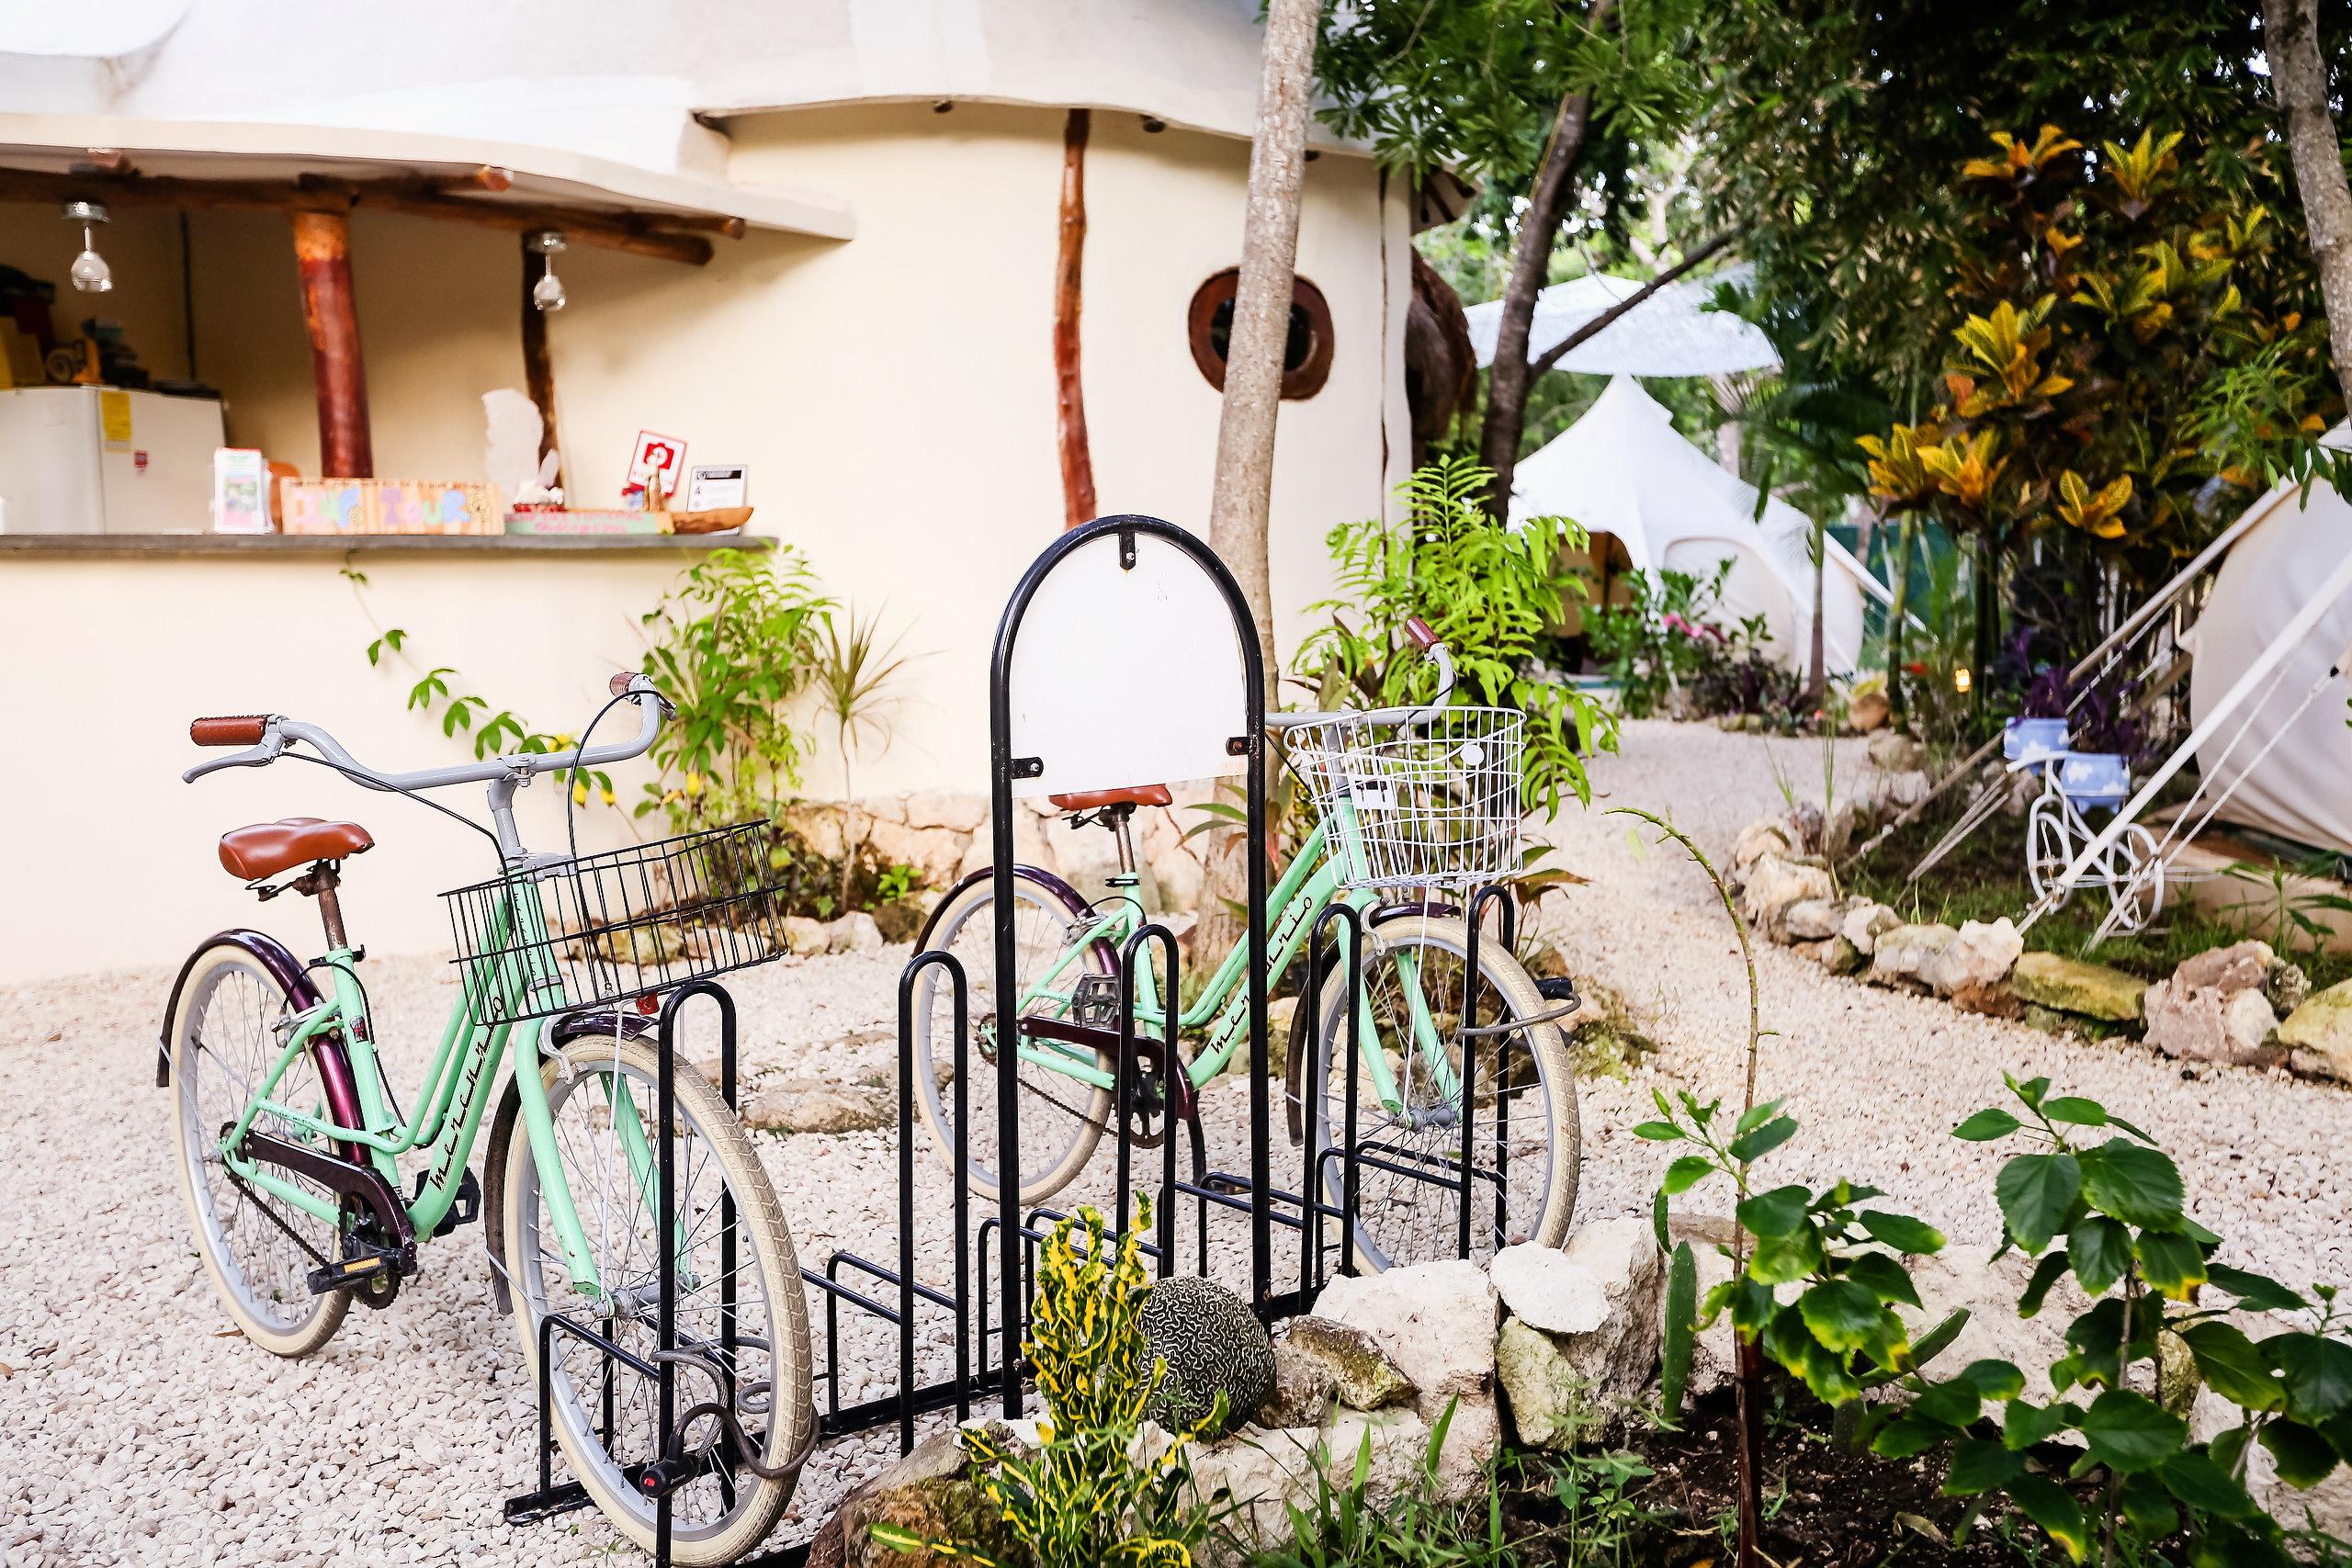 Reception and Bike Rental